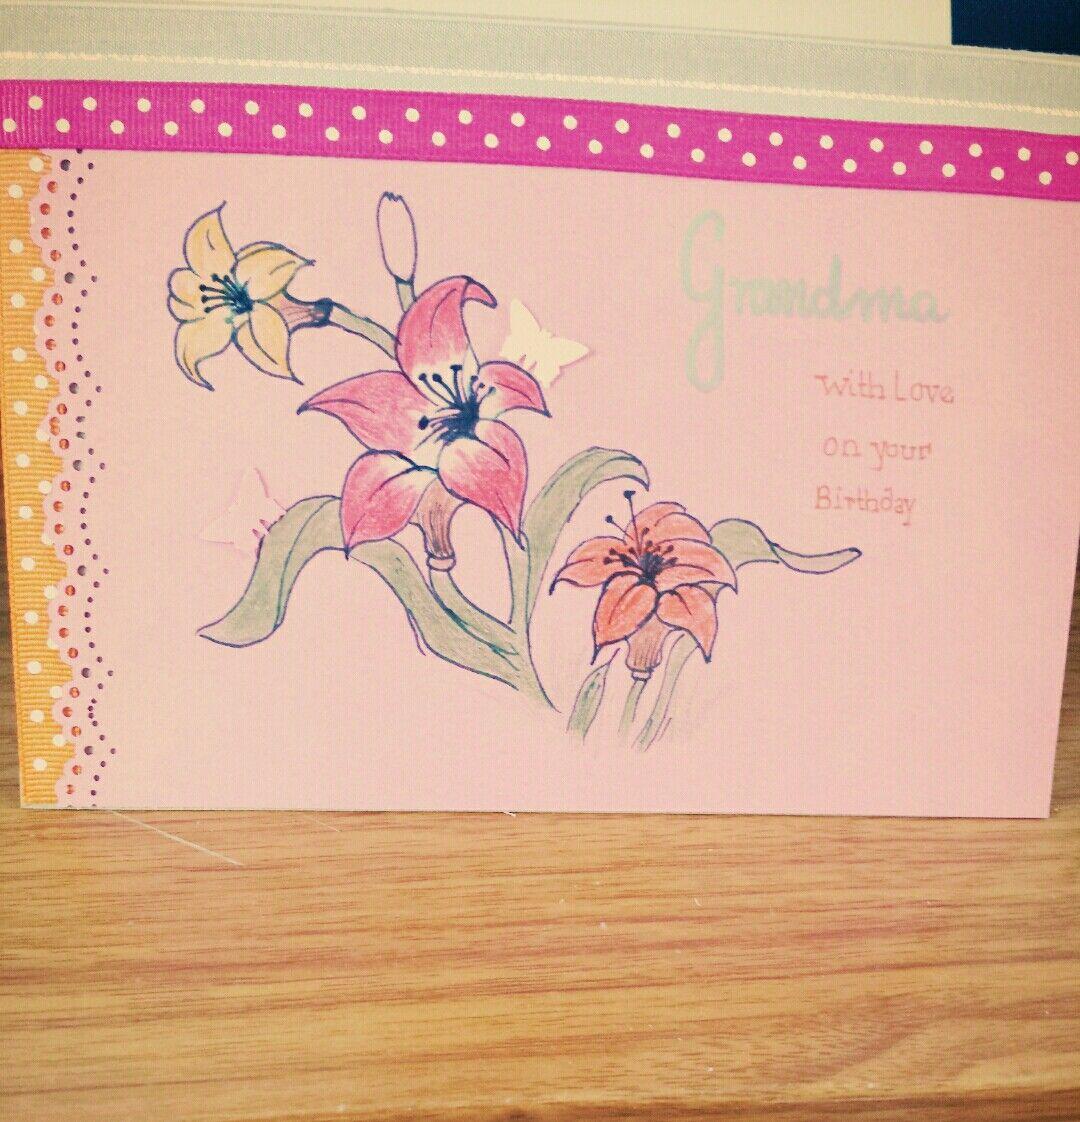 Grandma birthday card hand drawn cards pinterest hand drawn cards